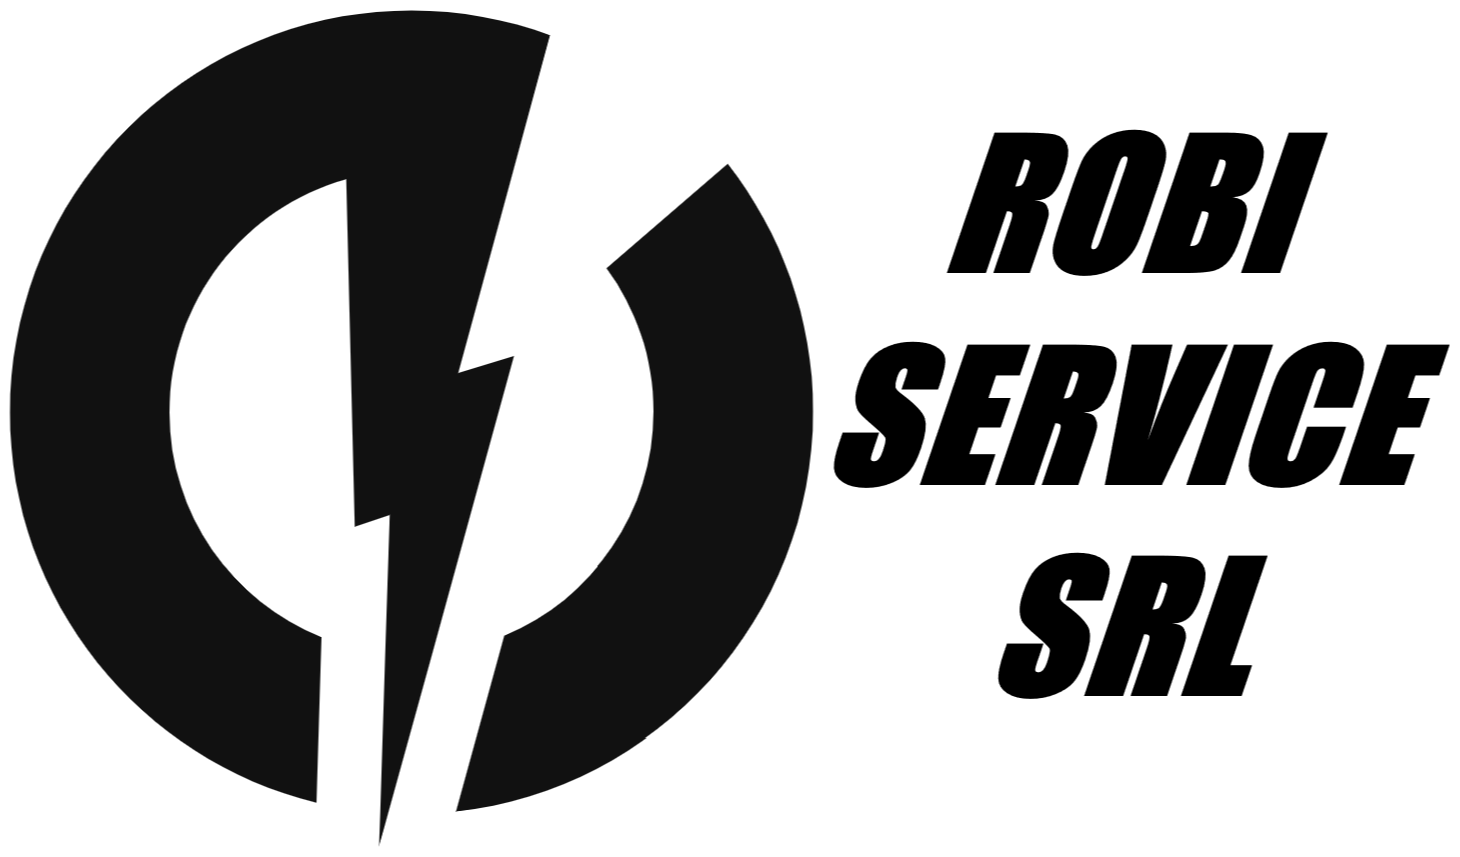 ROBI SERVICE SRL